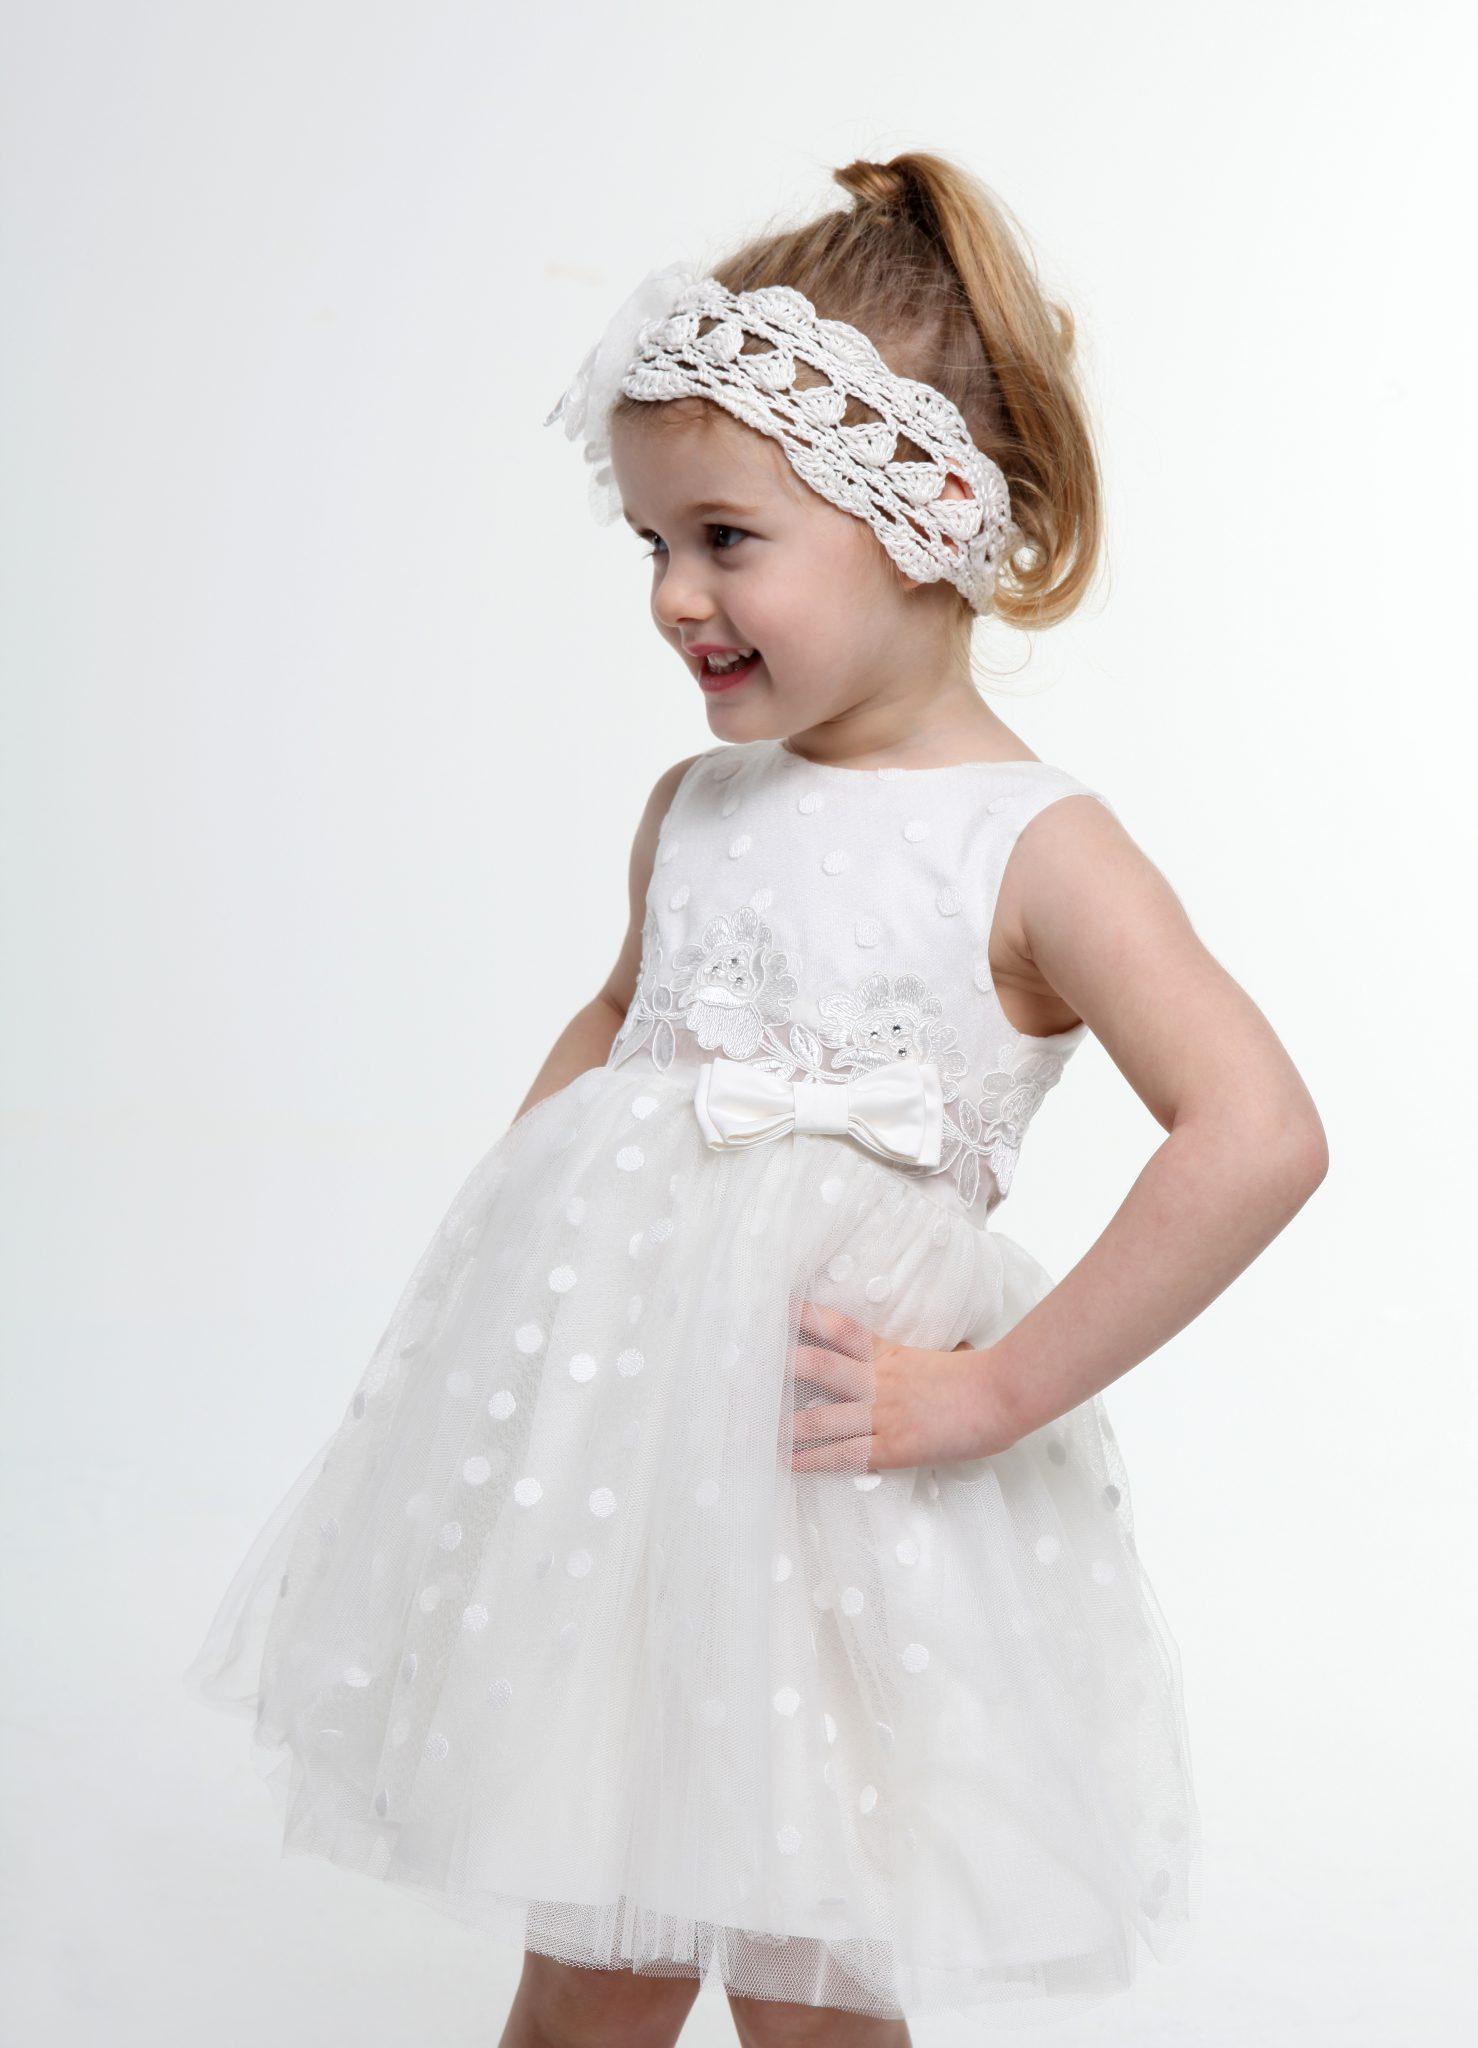 7d3aedec8b6 Βαπτιστικά Ρούχα για Κορίτσι 59 | Γάμος & Βάπτιση στο Ηράκλειο Κρήτης